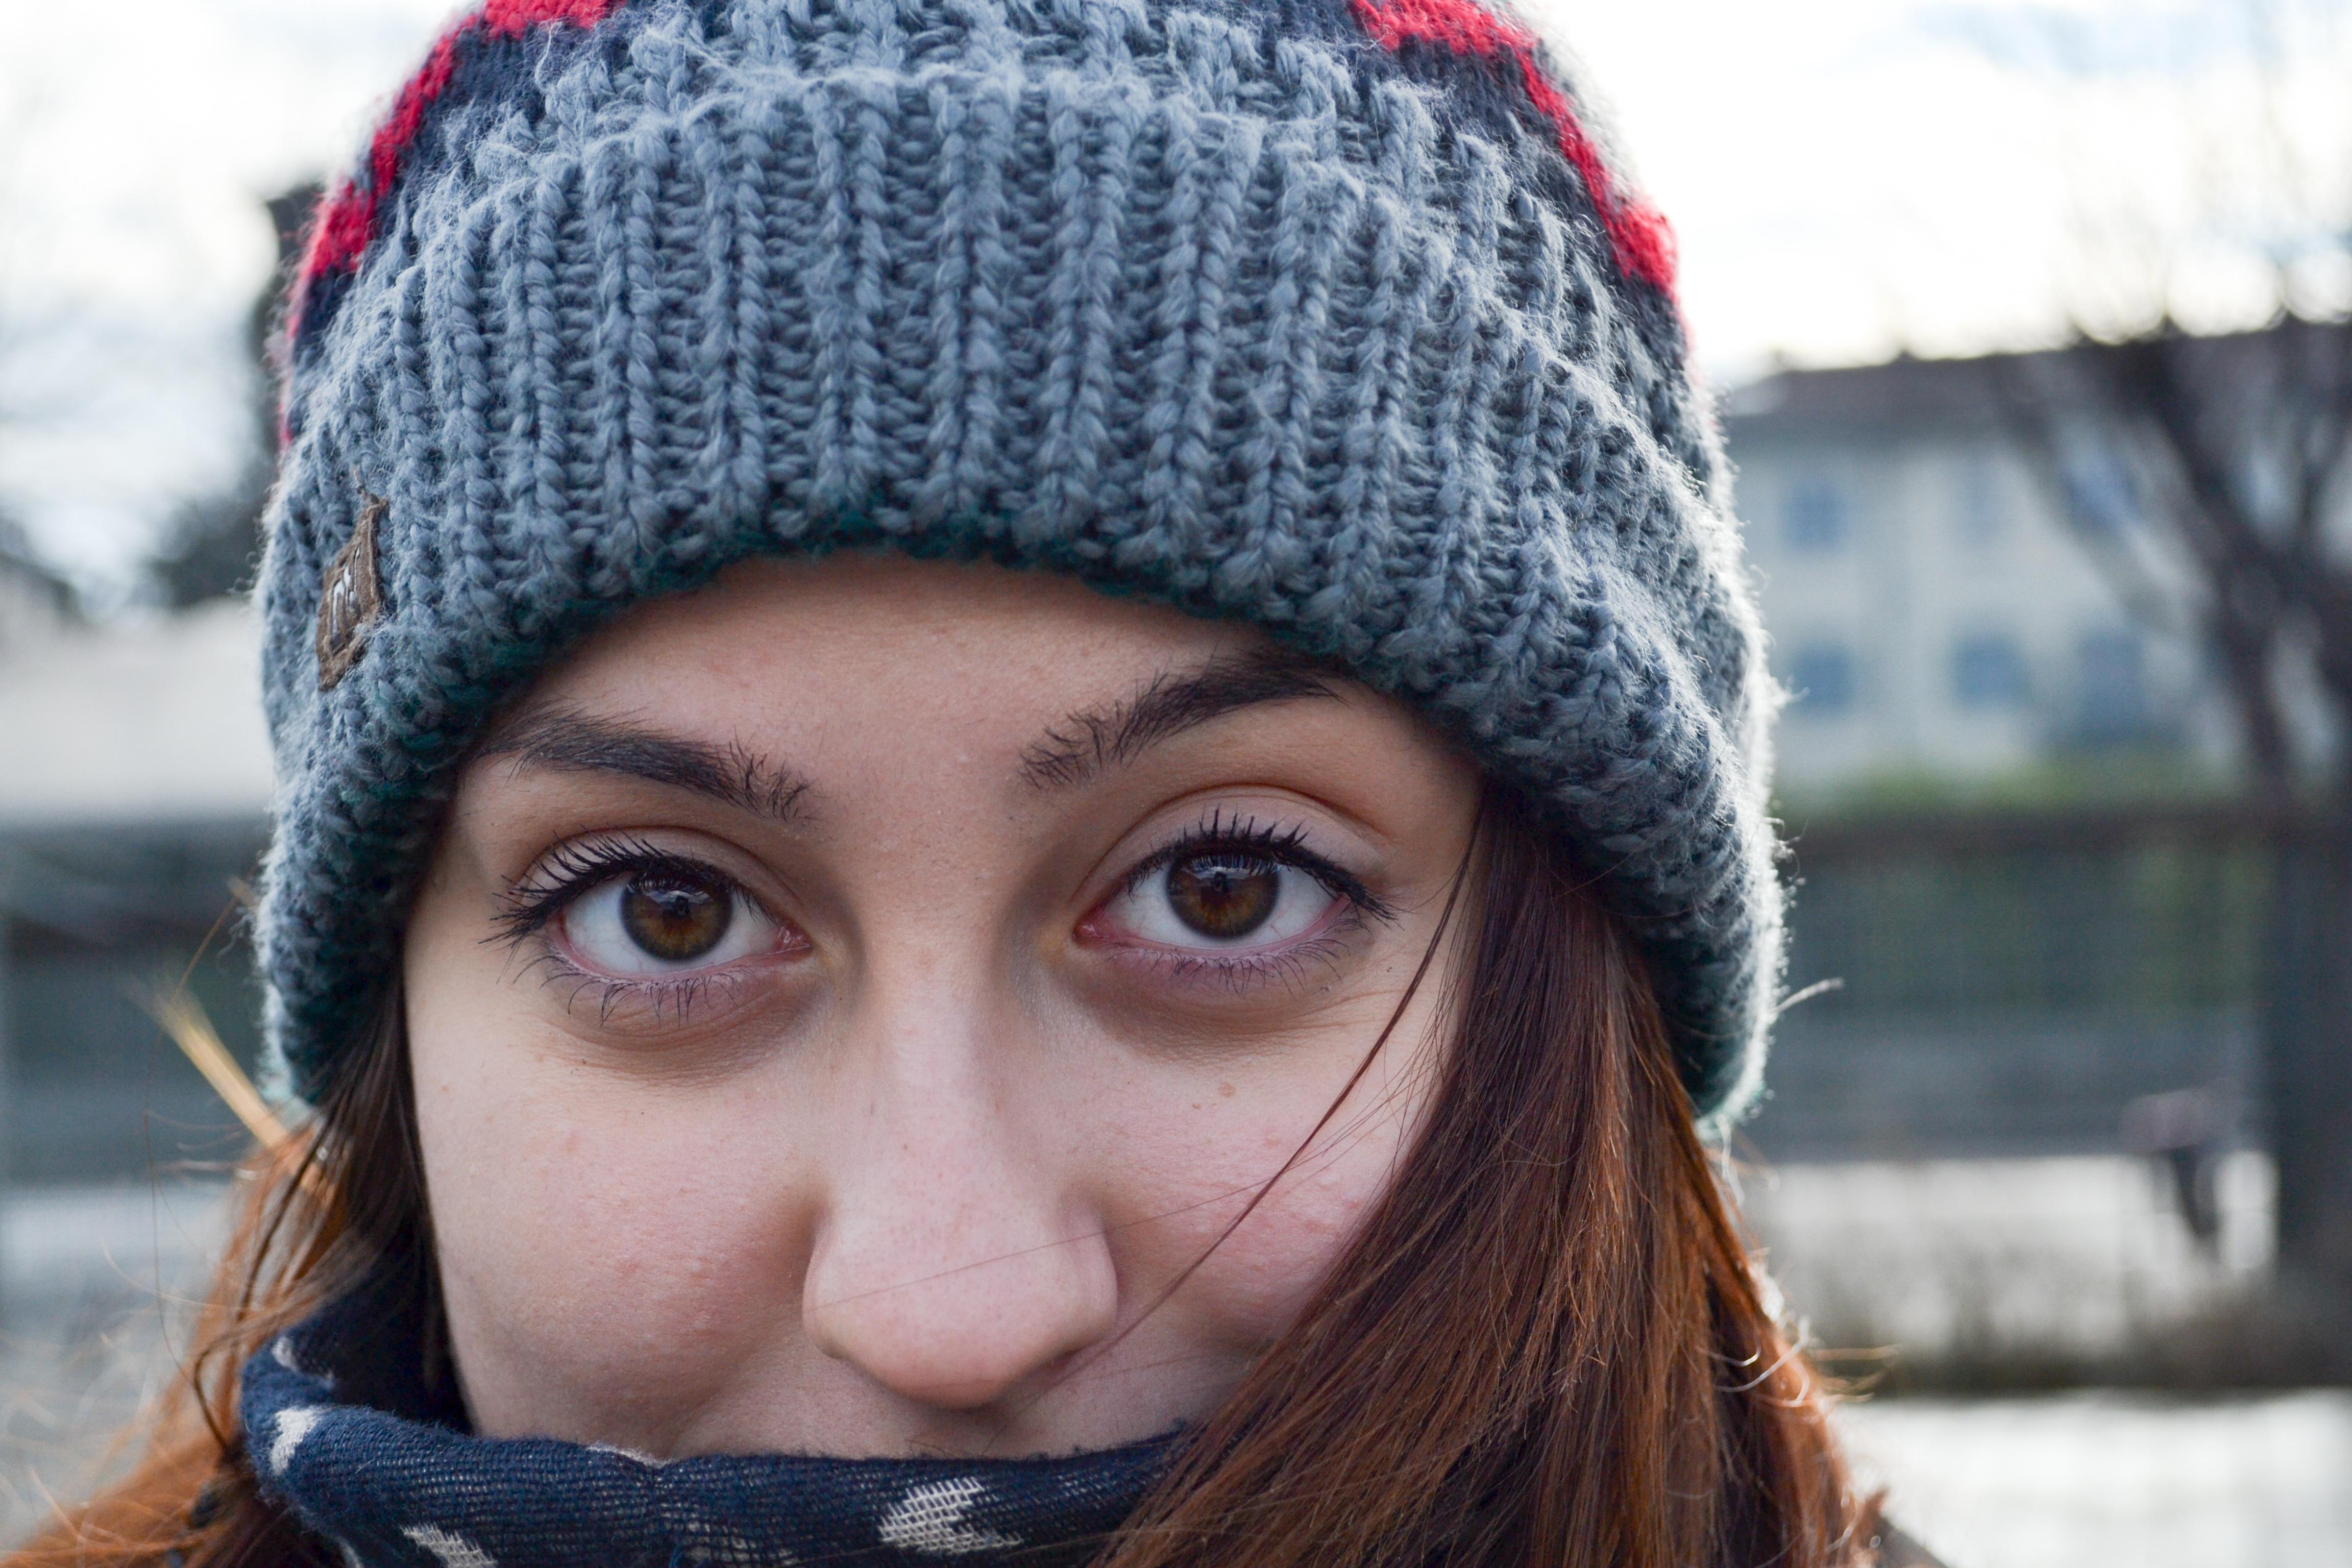 Fotos gratis : invierno, niña, retrato, modelo, color, sombrero ...